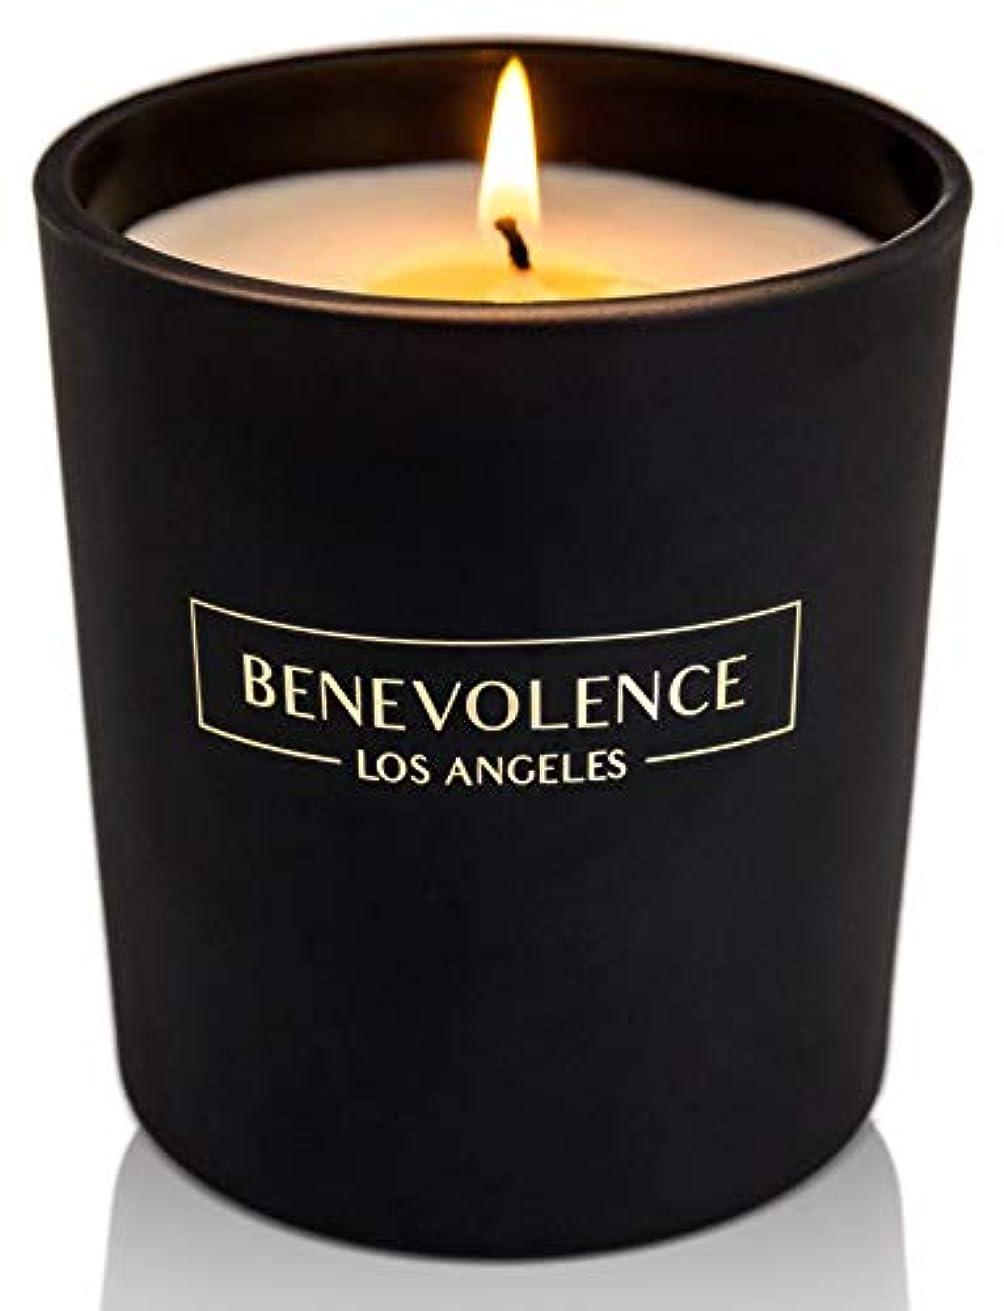 (Rose + Sandalwood) - Soy Scented Candle Natural Rose & Sandalwood Strong Fragrance Matte Black Glass for Charity